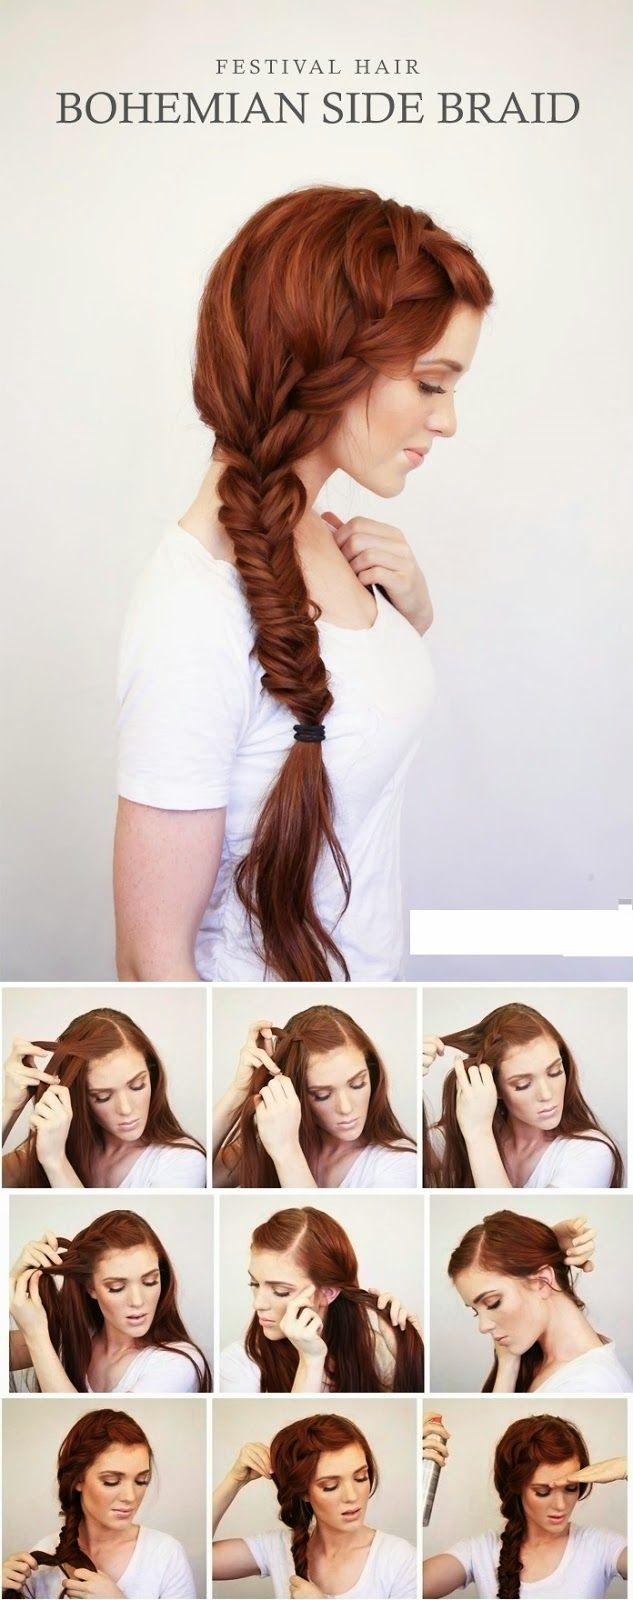 Super 1000 Ideas About Side Braid Tutorial On Pinterest Side Braids Short Hairstyles For Black Women Fulllsitofus